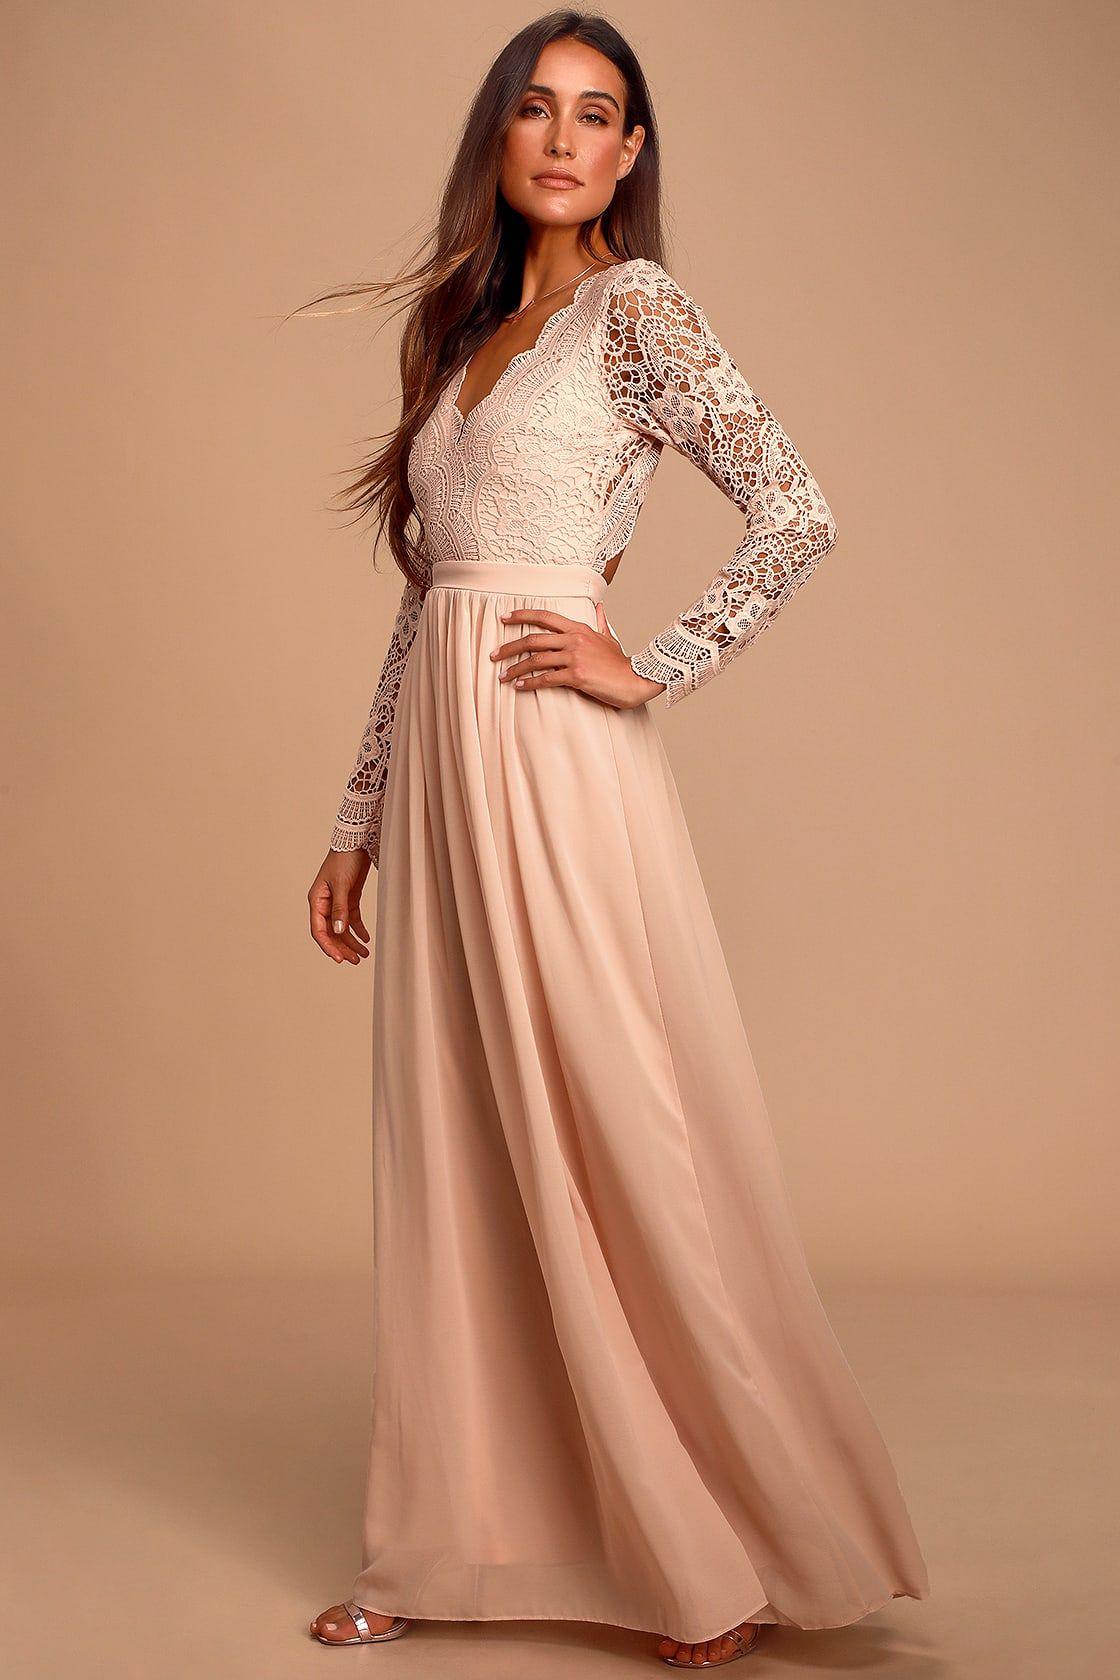 Awaken my love blush pink long sleeve lace maxi dress